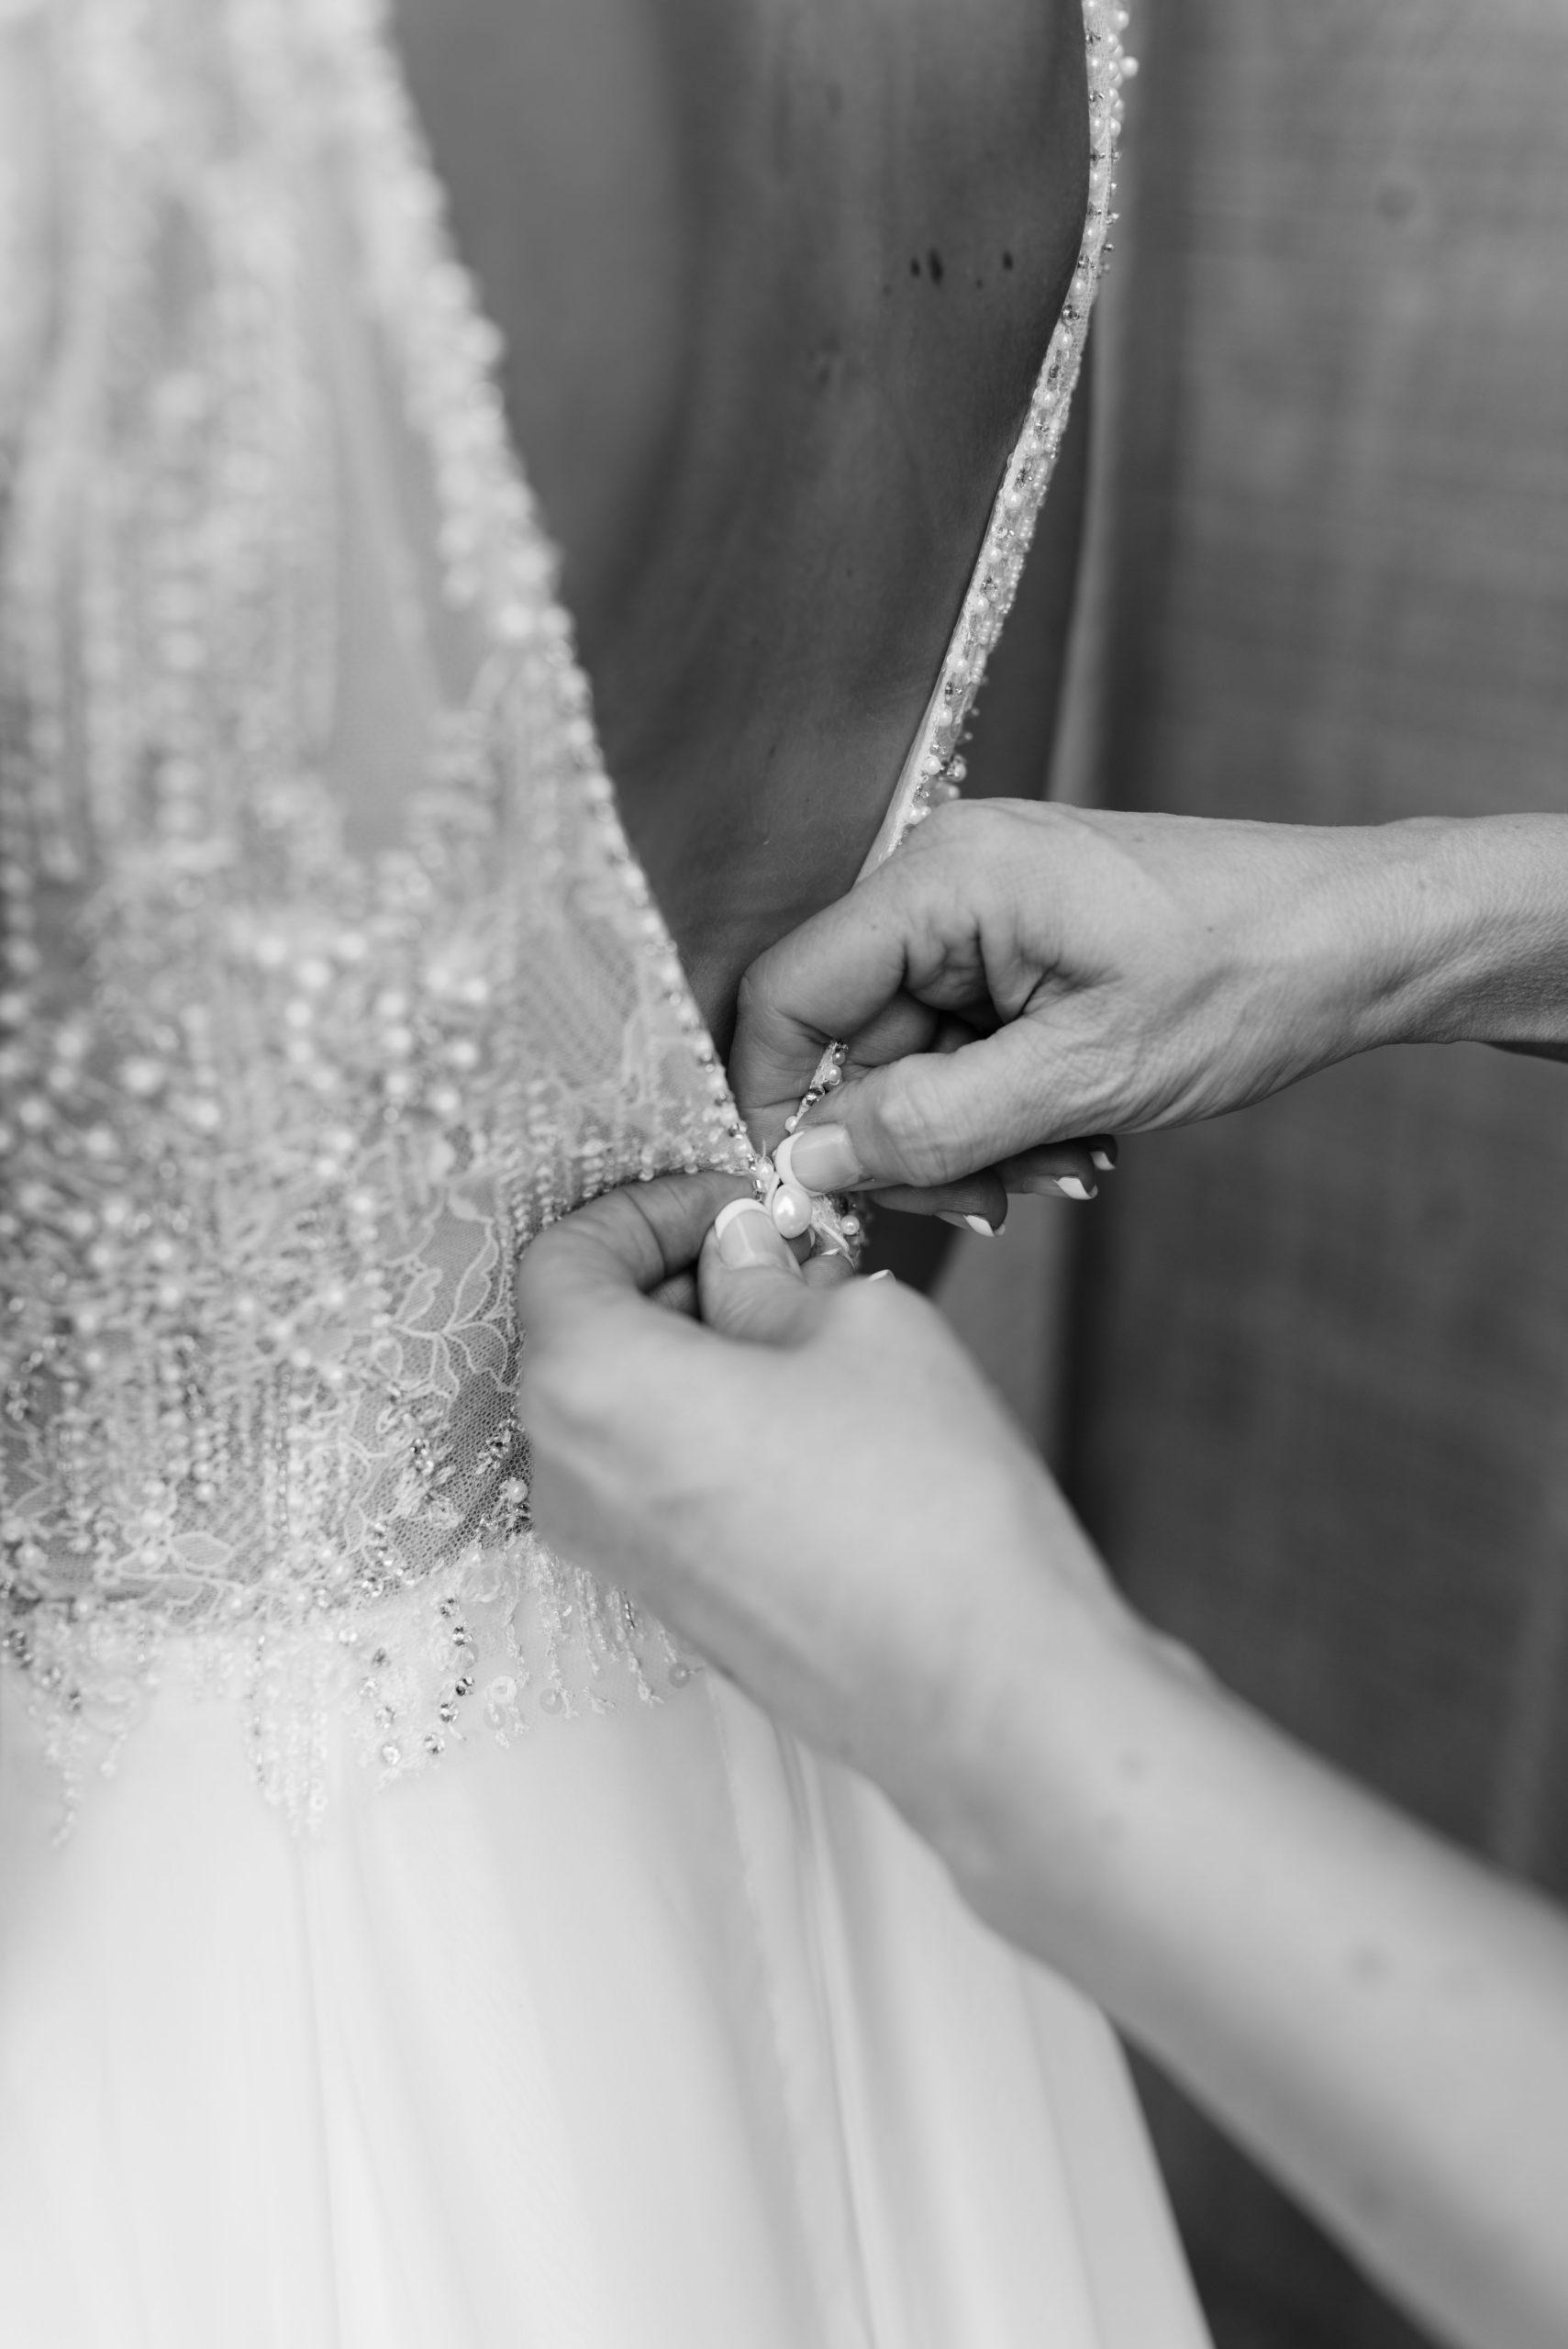 mom buttoning wedding dress schafer century barn wedding venue